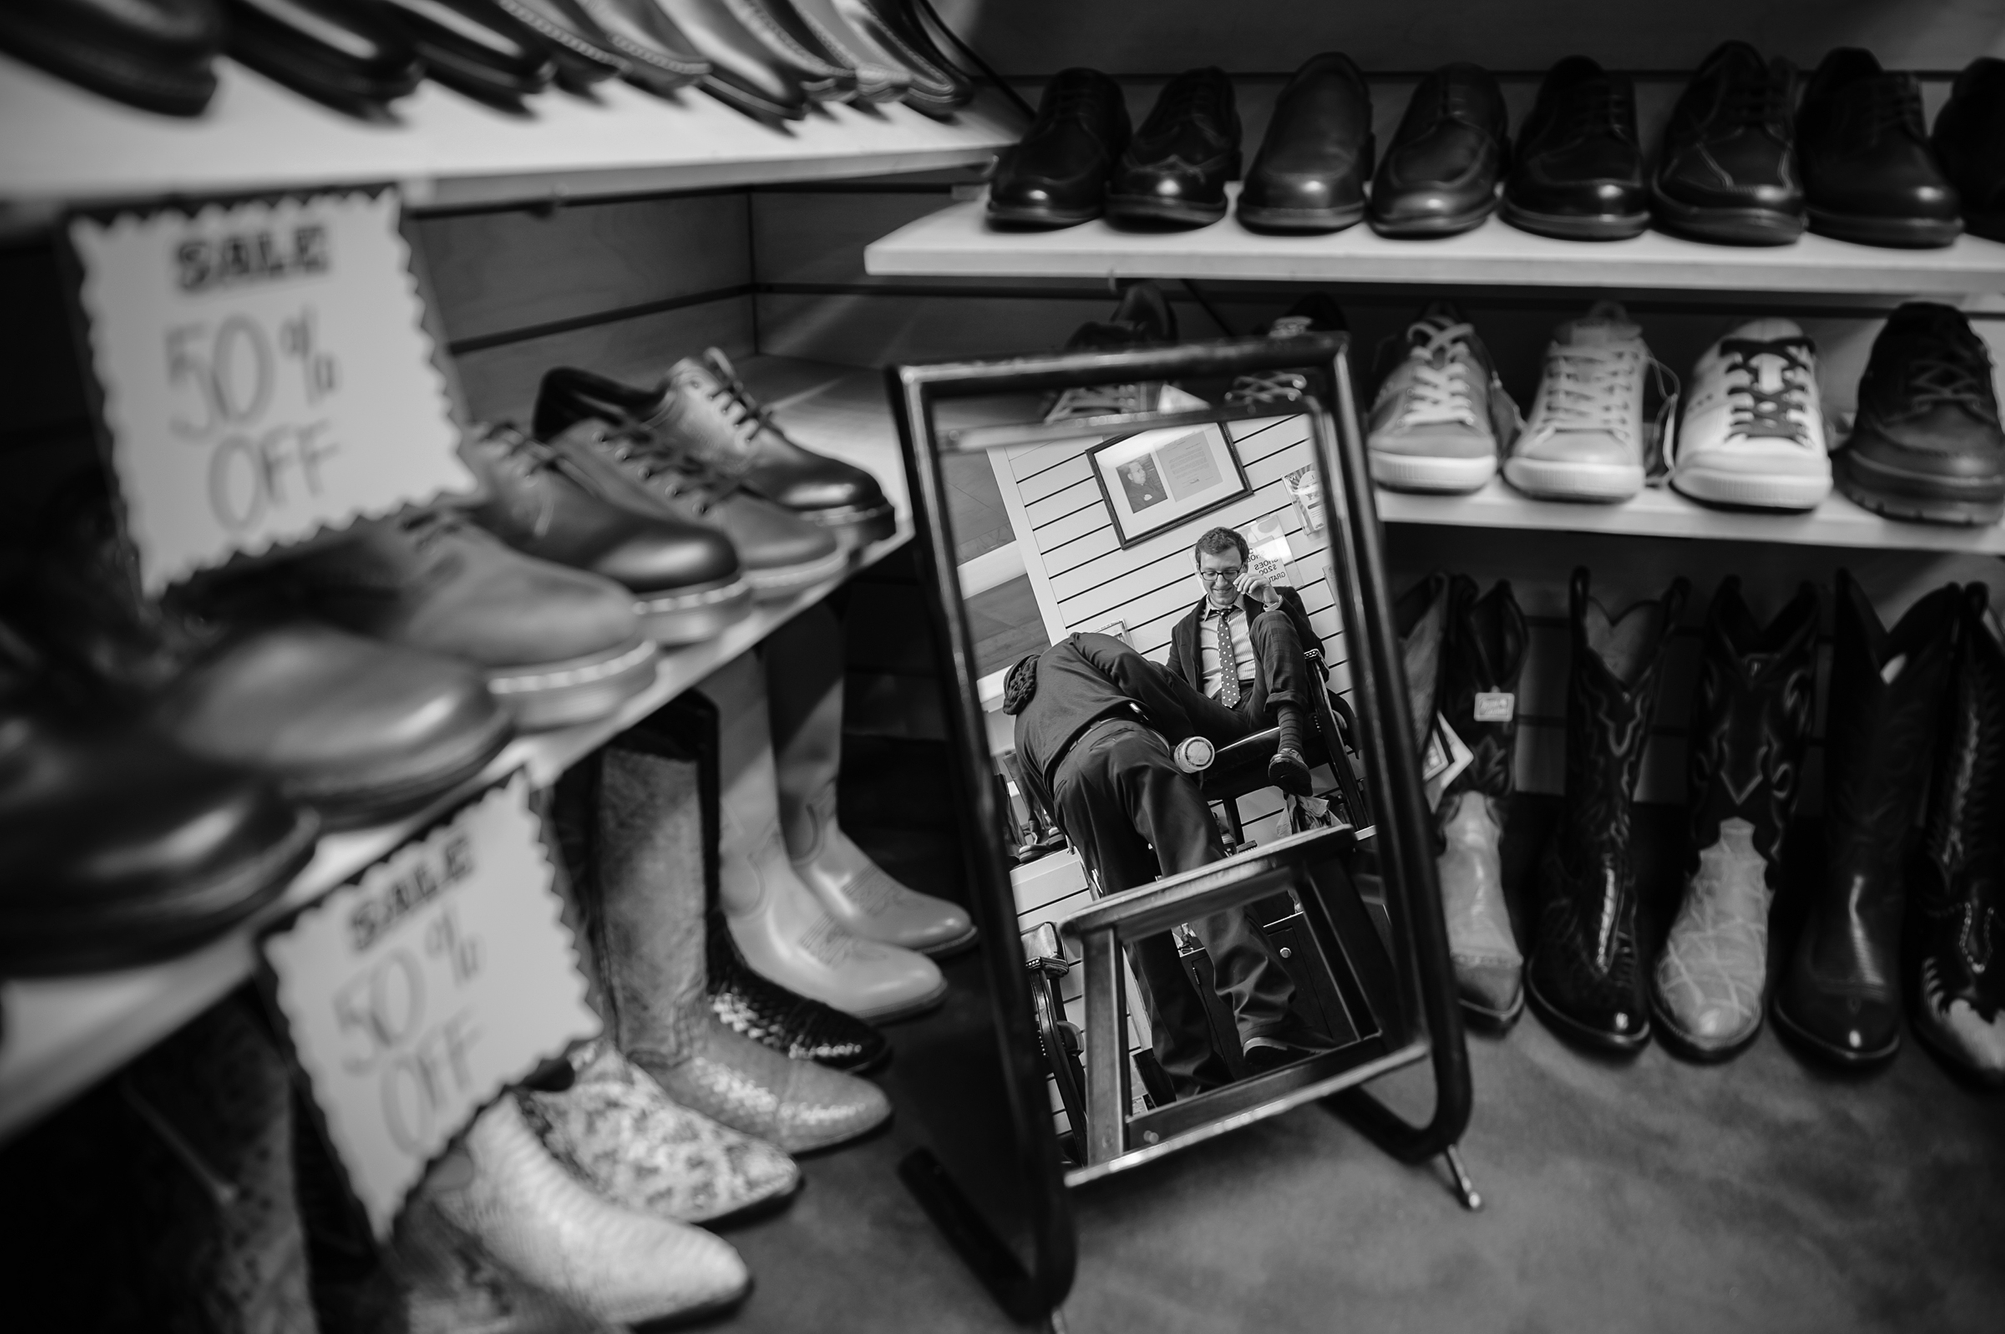 20141111_Altman_Shoes_CCB_Life_1019_Warm.jpg